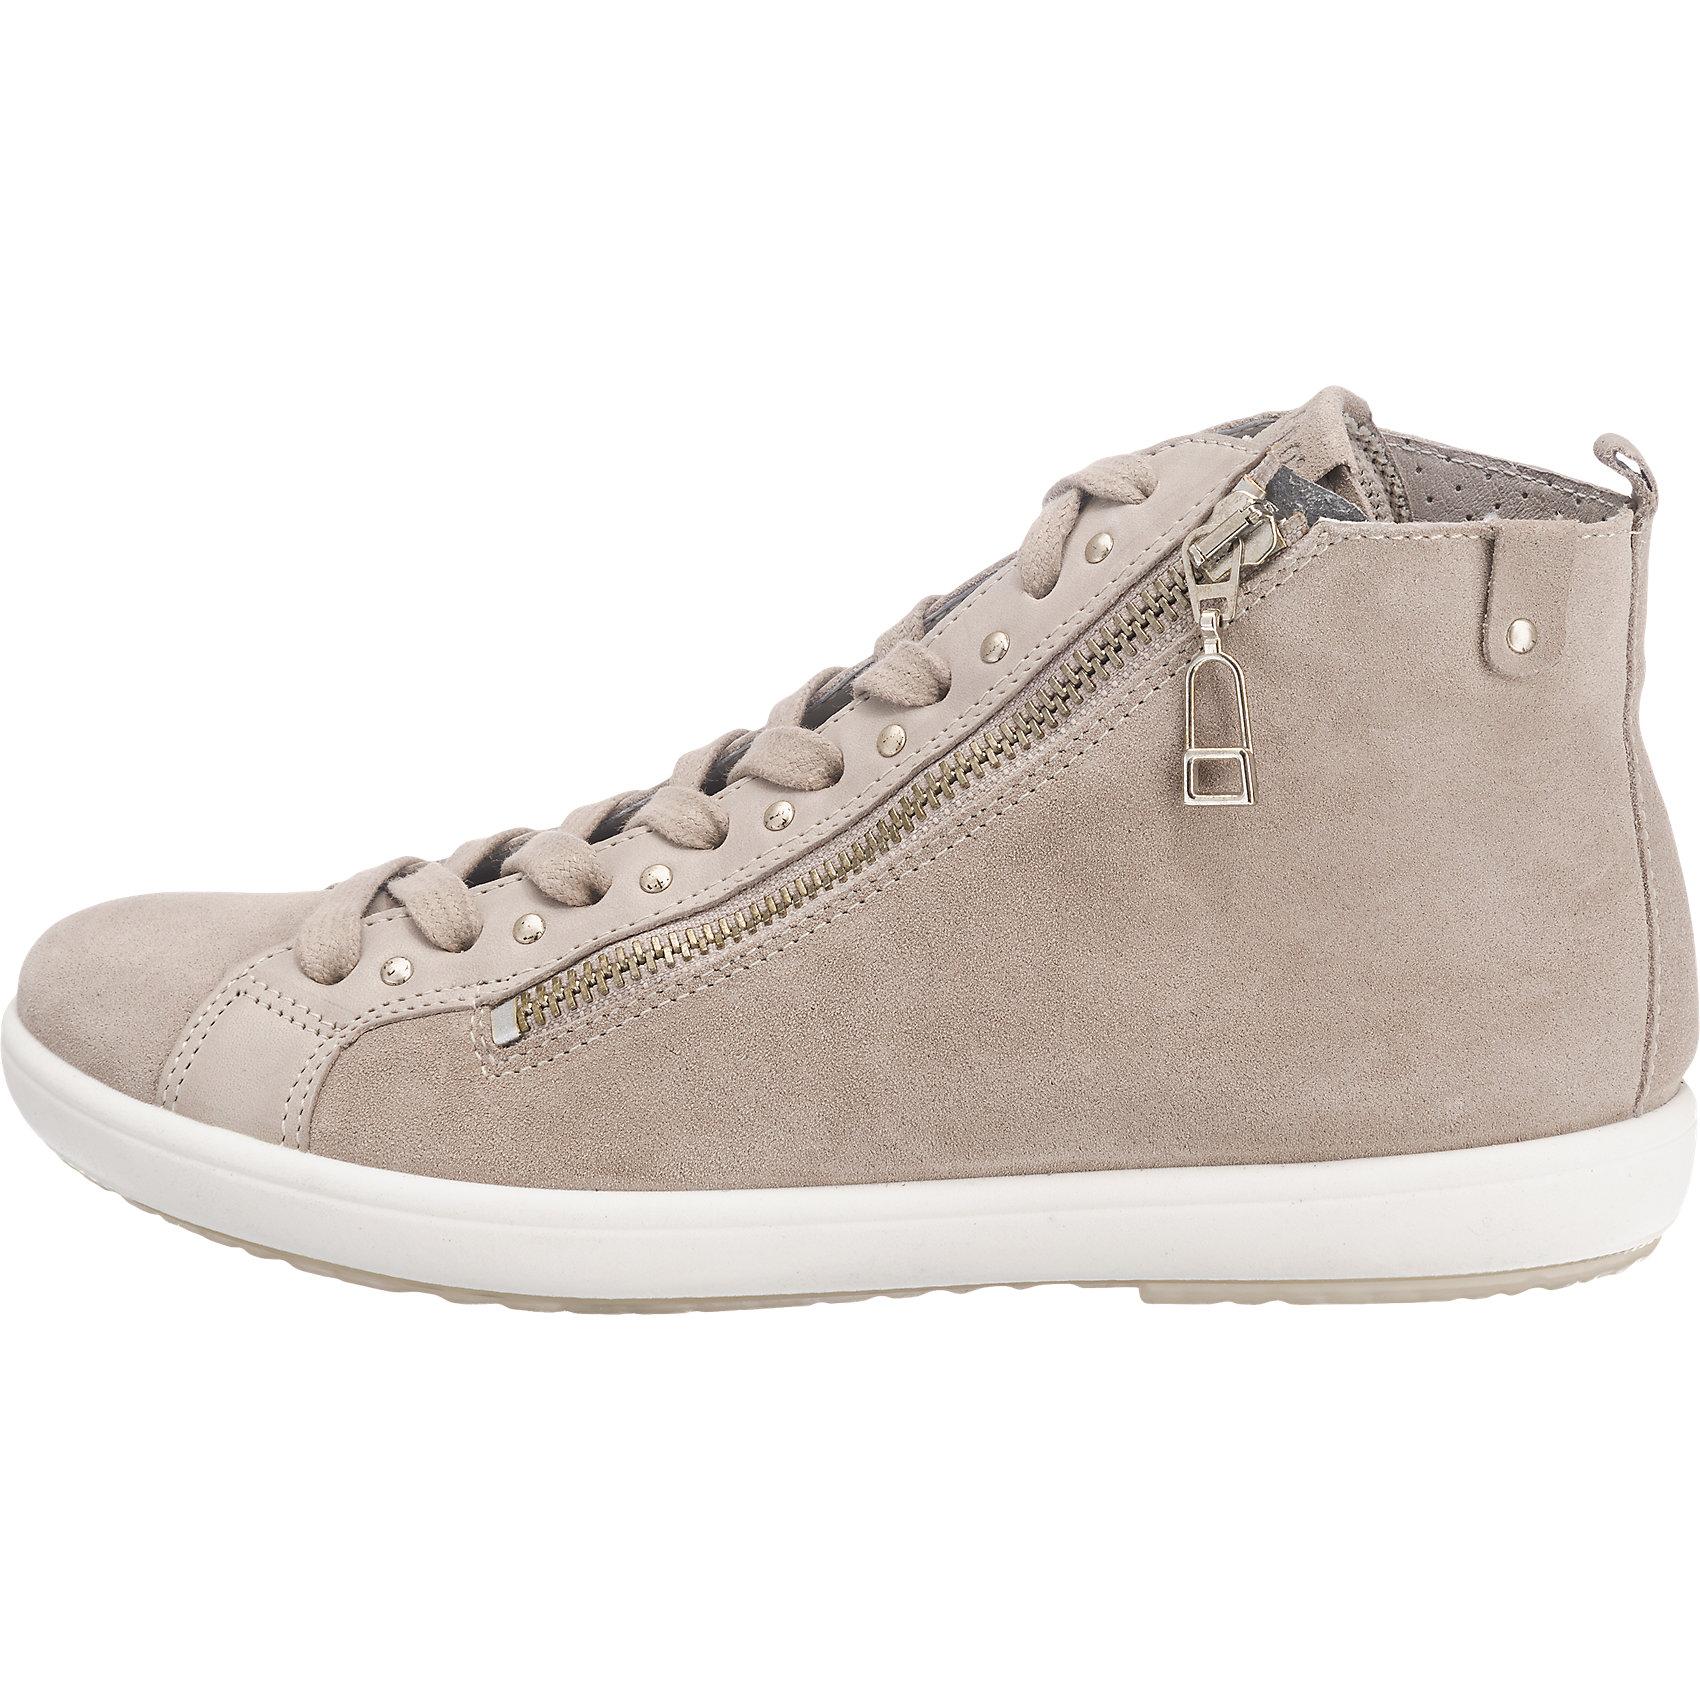 huge sale reasonable price first look Details zu Neu Legero Trapani Sneakers grau 5771706